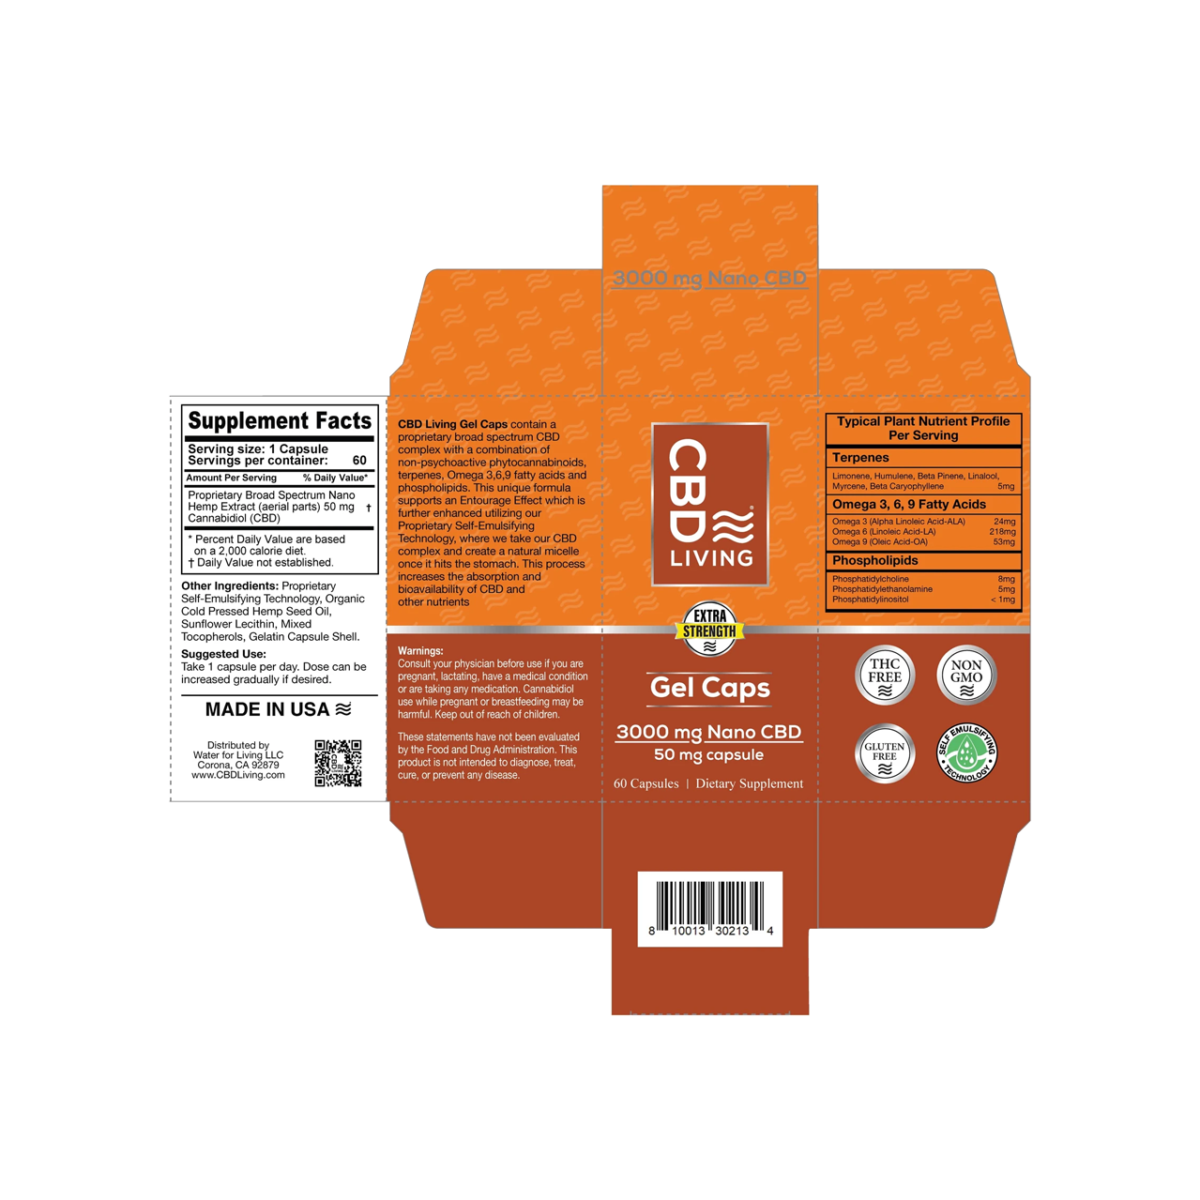 3000 мг. Капсулы CBD (КБД) 60шт., 50мг. КБД в Капсуле, Витаминный Комплекс, Gel Capsules 3000 mg CBD Living, США